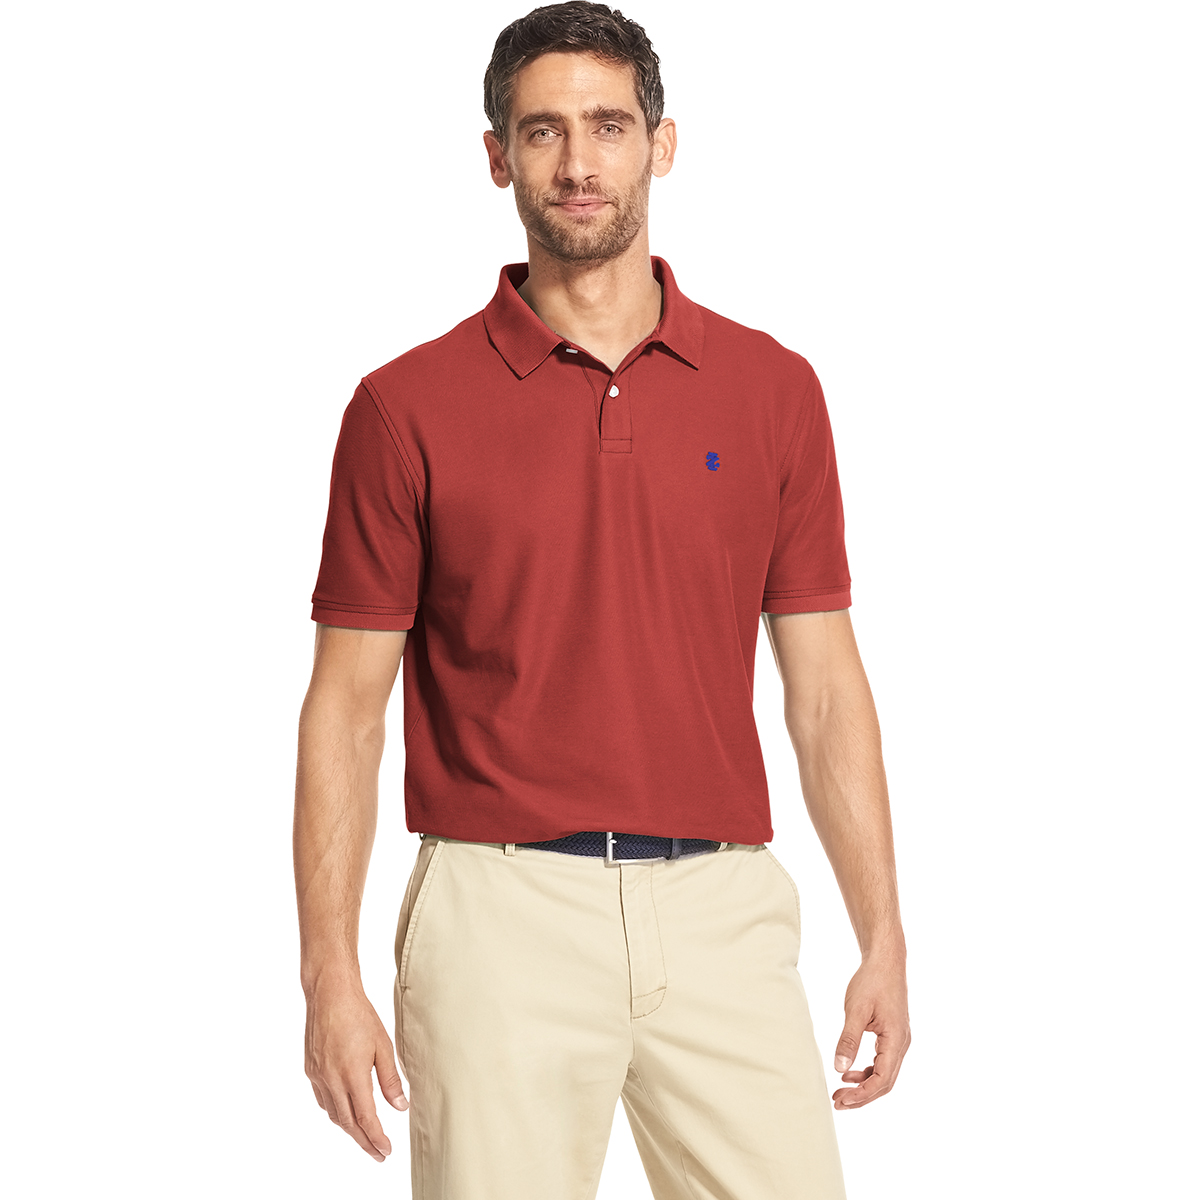 Izod Men's Advantage Short-Sleeve Polo Shirt - Red, XL